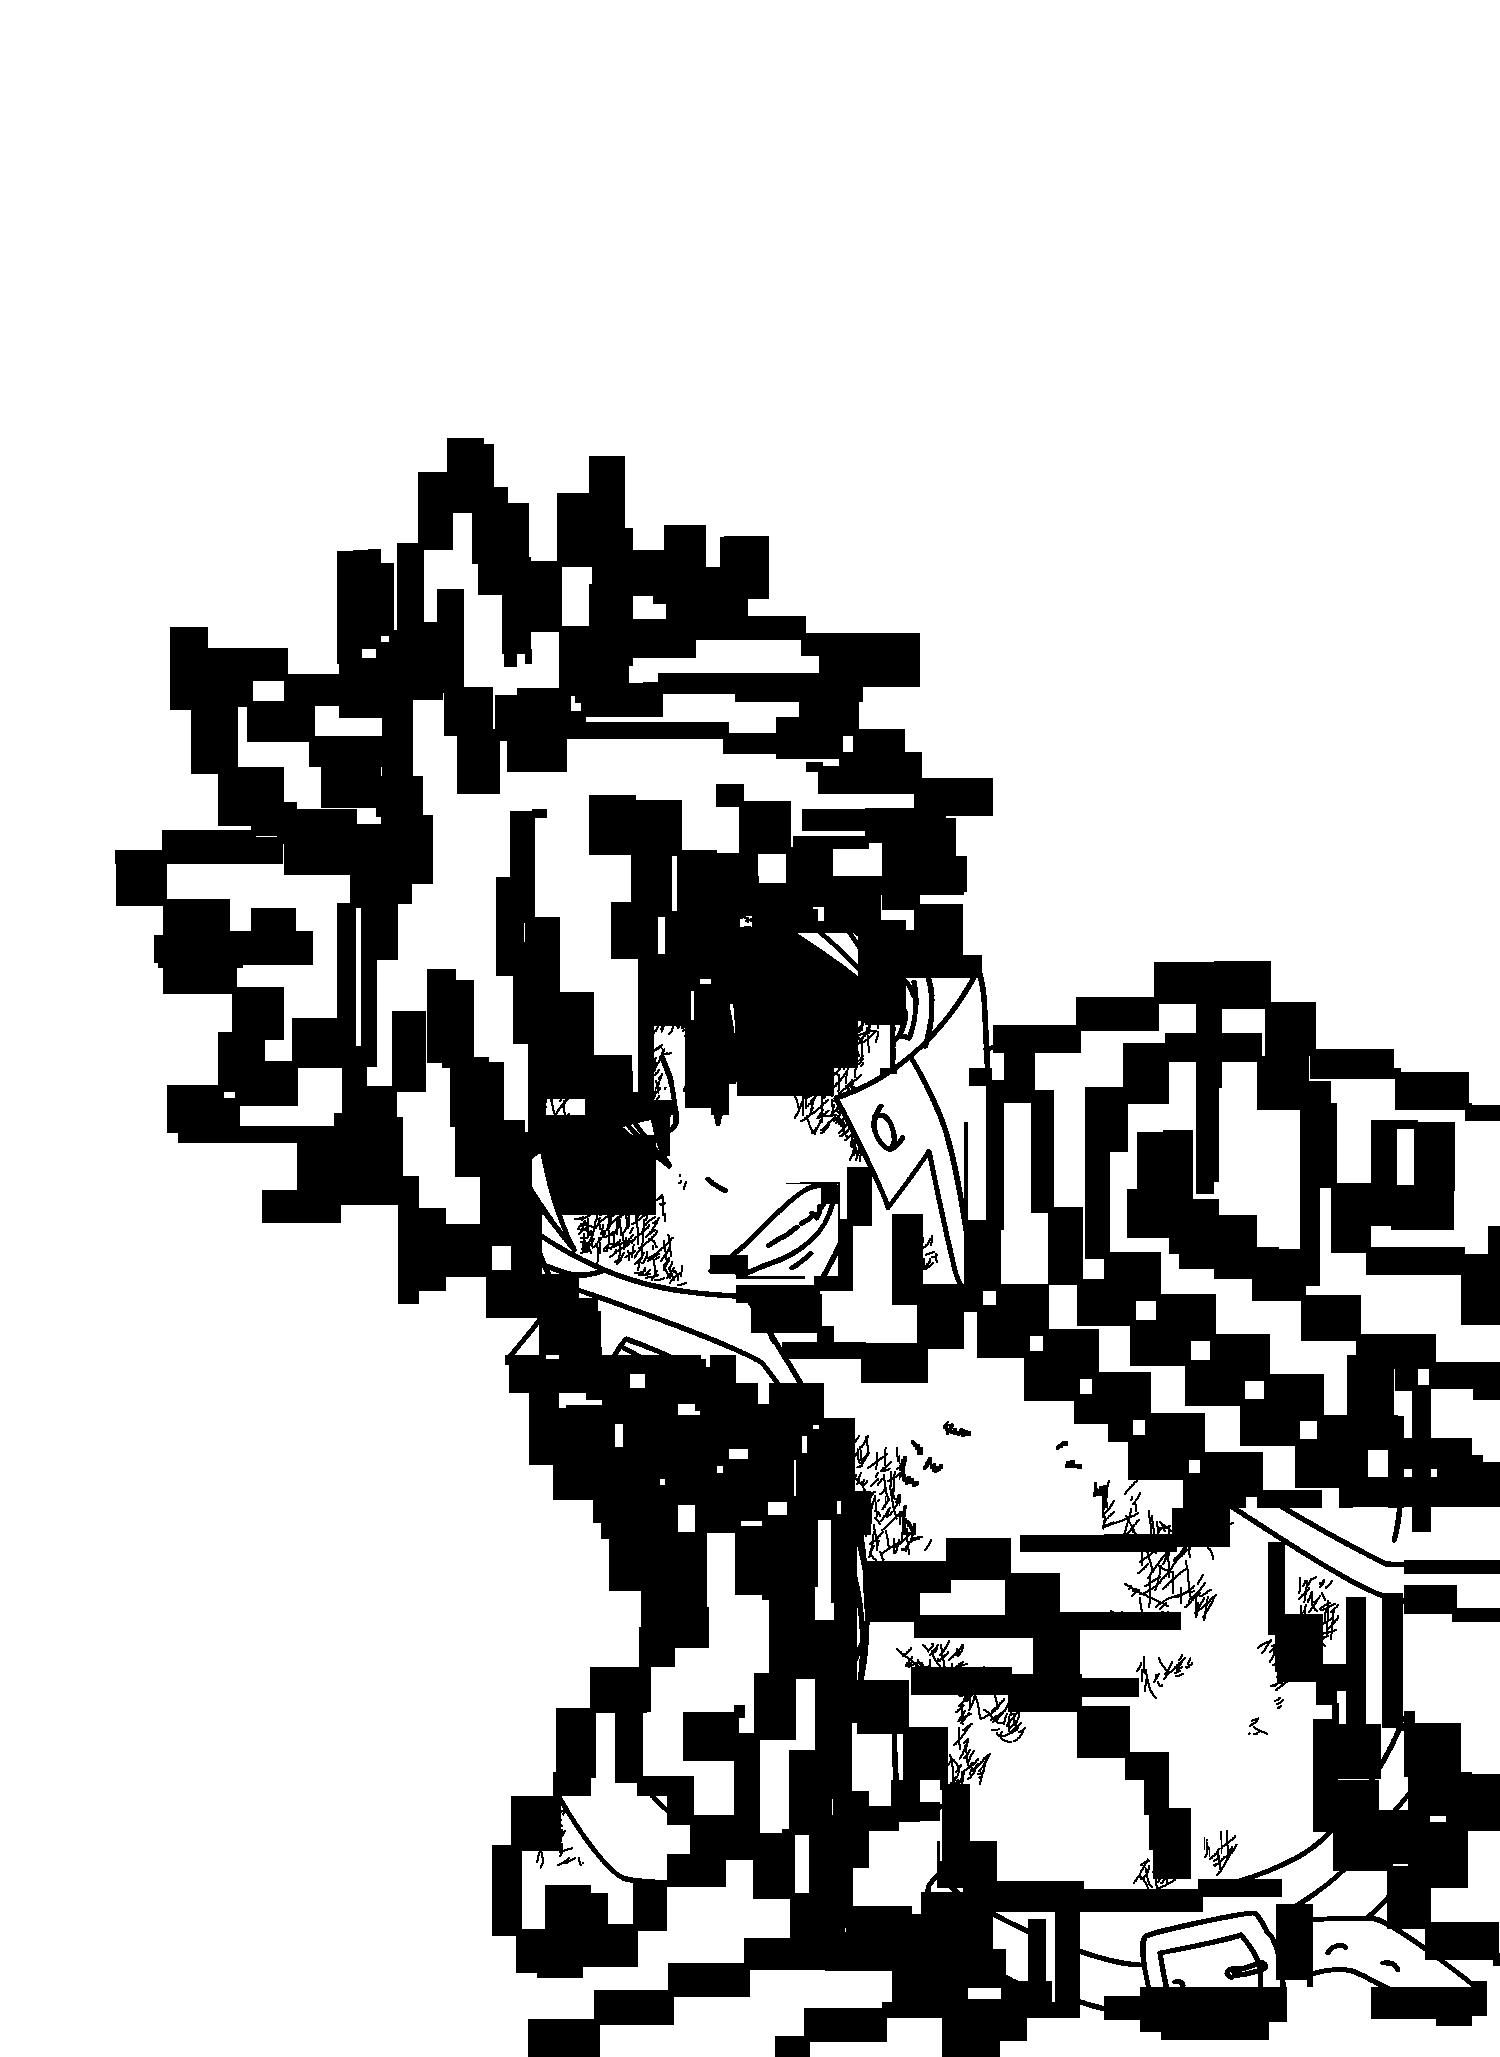 Natsu Dragneel Lineart By Advance996 On Deviantart Natsu Natsu Dragneel Sketches